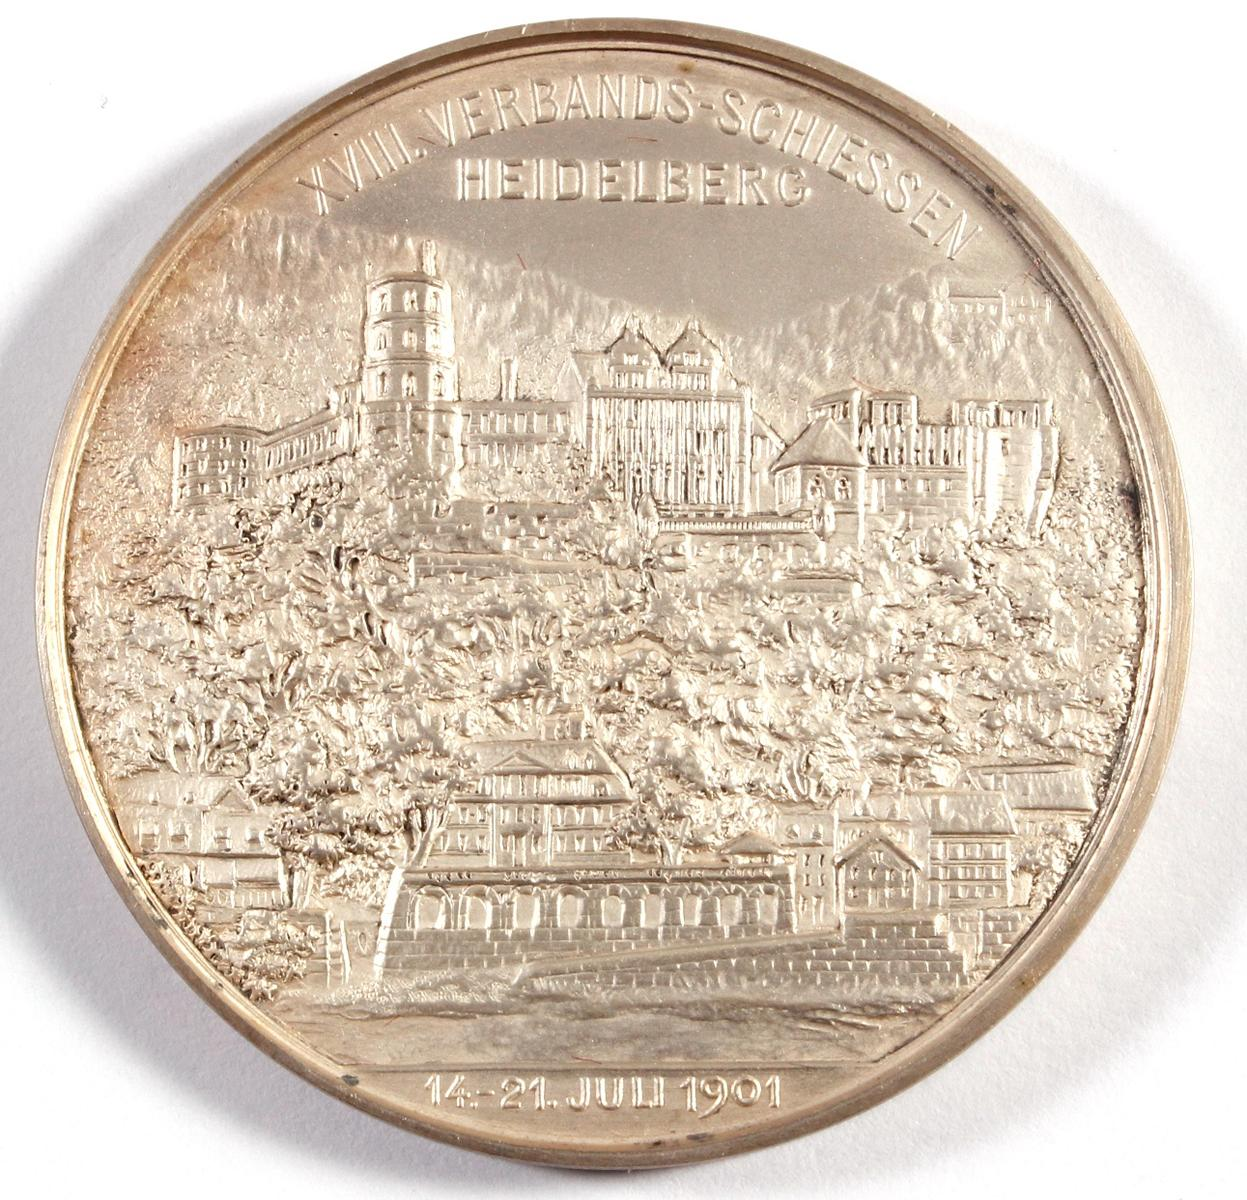 Medaille, XVIII. Verbandsschiessen Heidelberg 1901-2